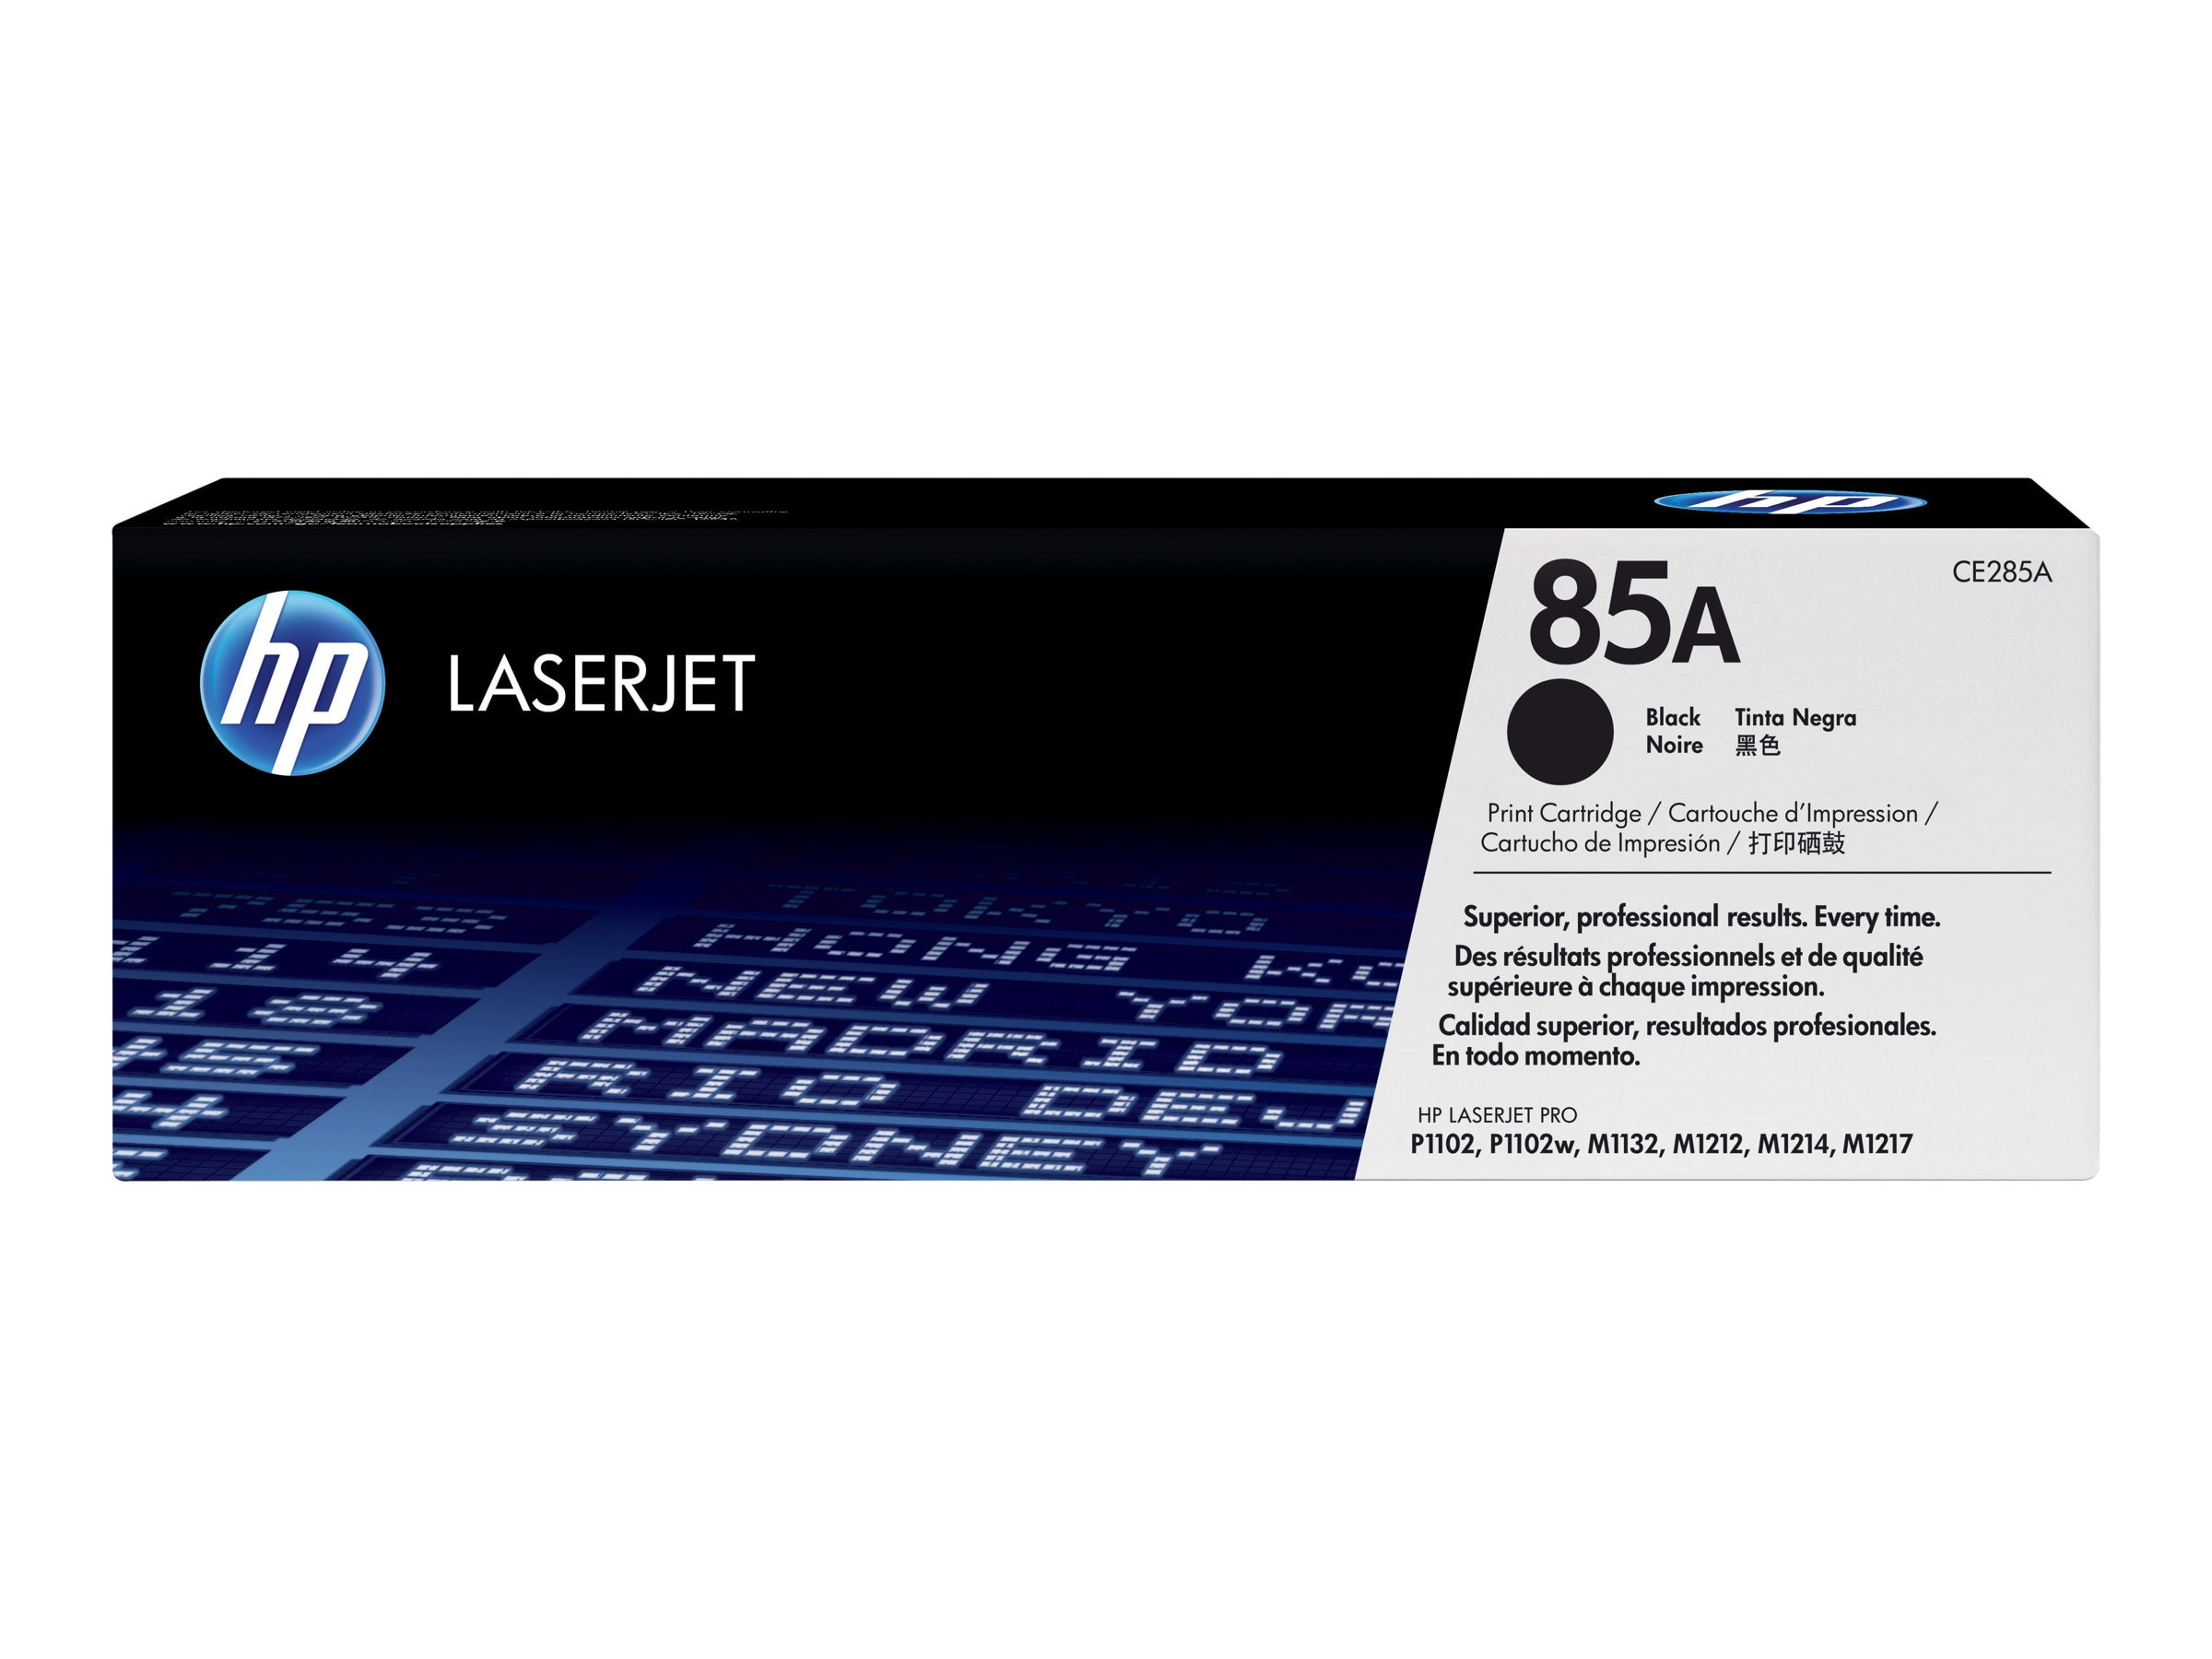 HP 85A (CE285A) Black Original LaserJet Toner Cartridge for HP LaserJet M1212nf, M1217nfw & P1102w, CE285A, 10983071, Toner and Imaging Components